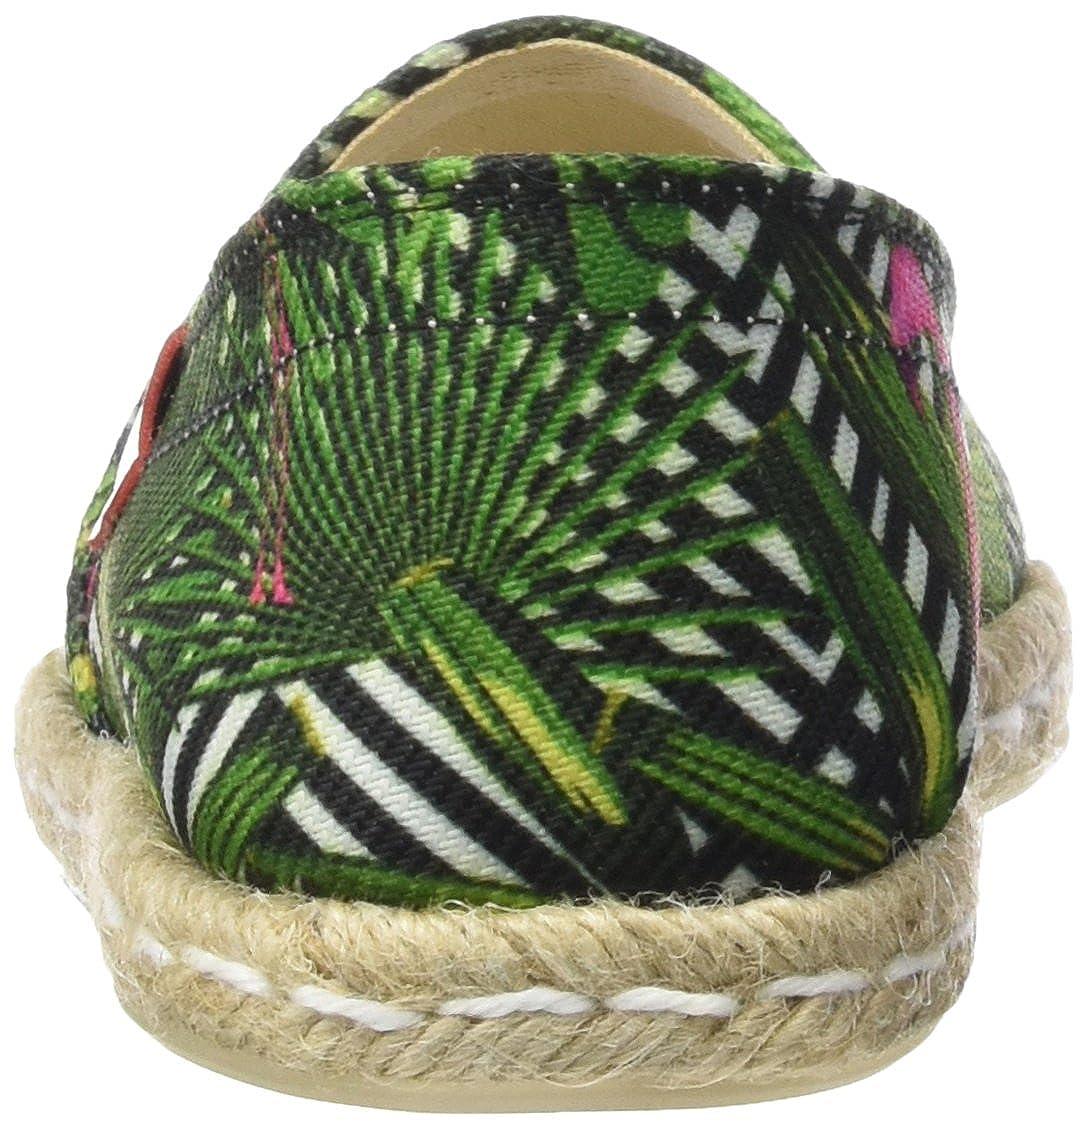 d54bdd5fd77c9 Amazon.com: MISS HAMPTONS Women's Sausalito Espadrilles: Shoes